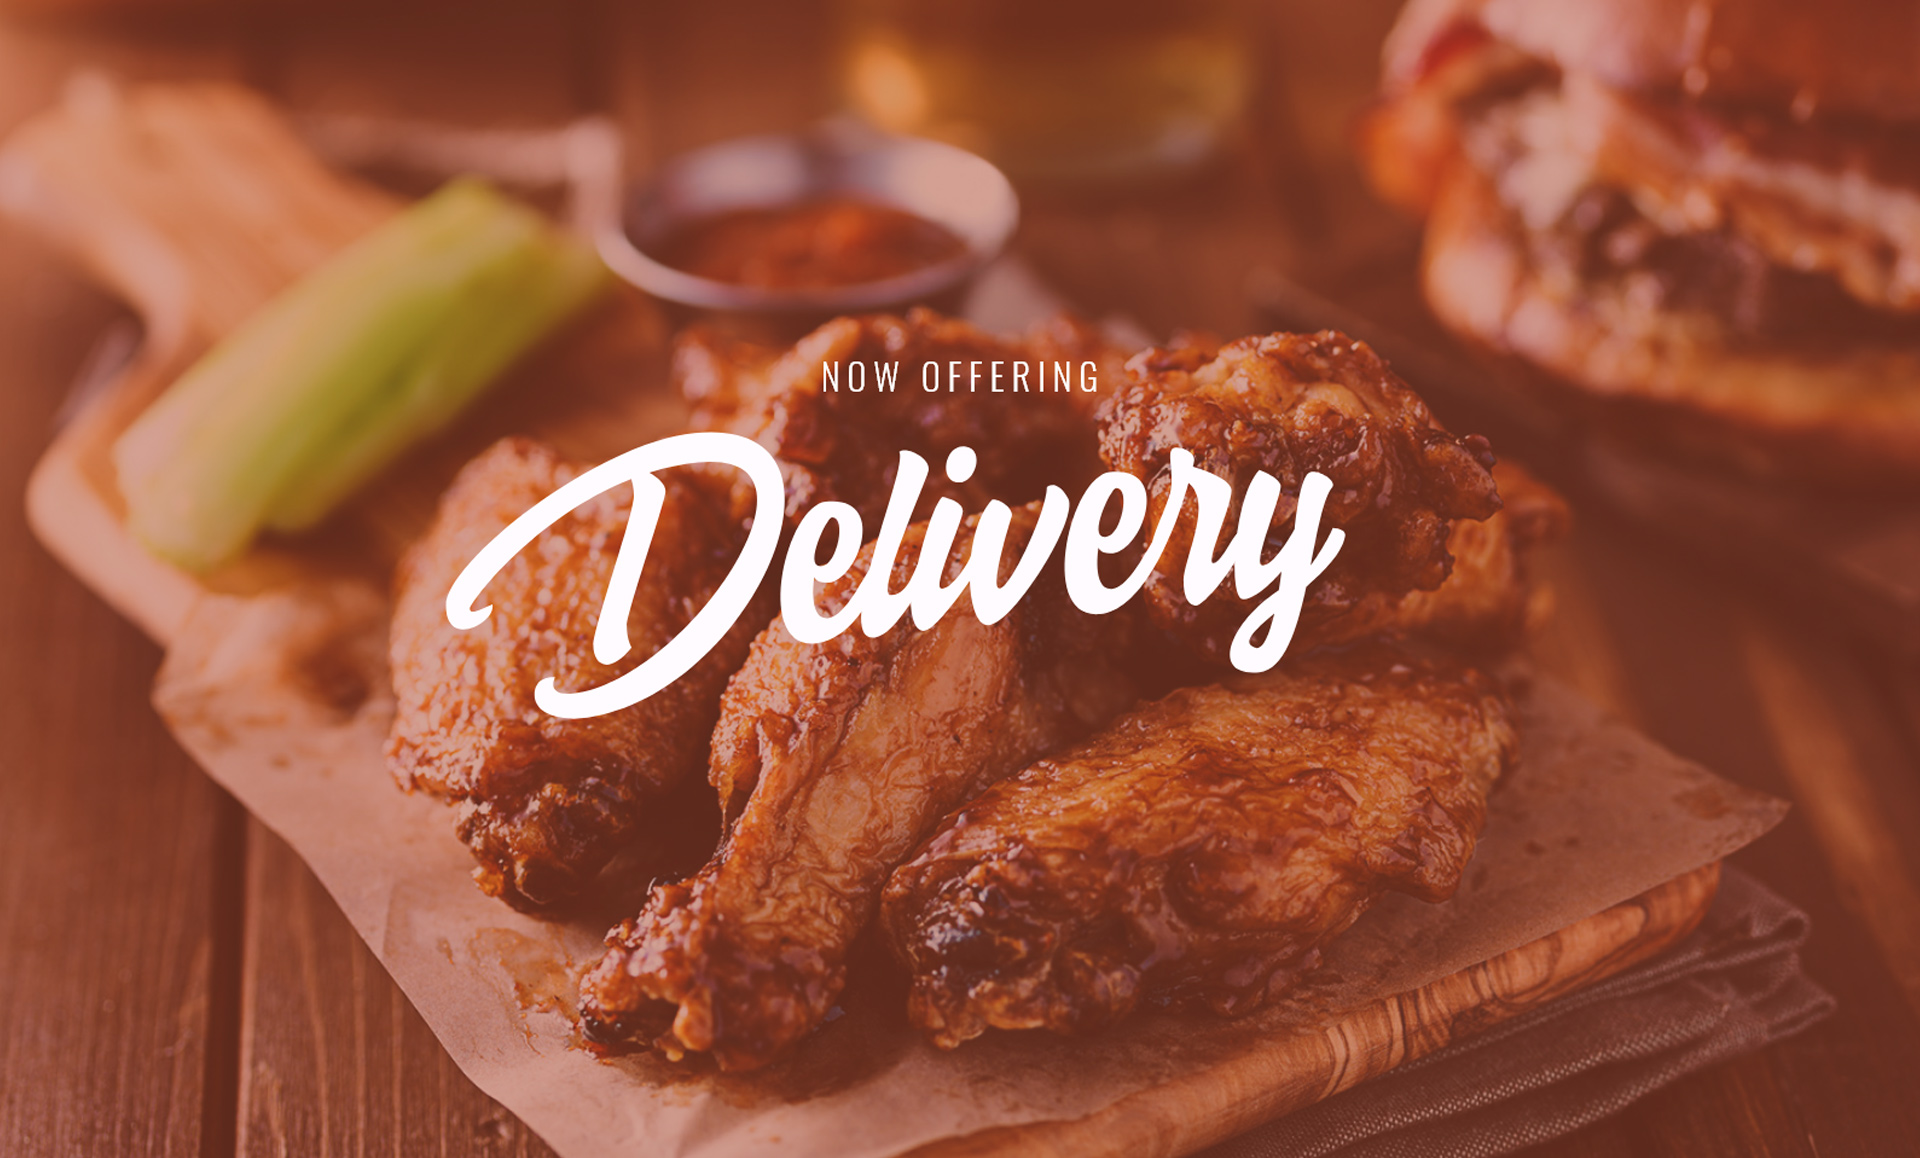 restaurant marketing brandts creek delivery option